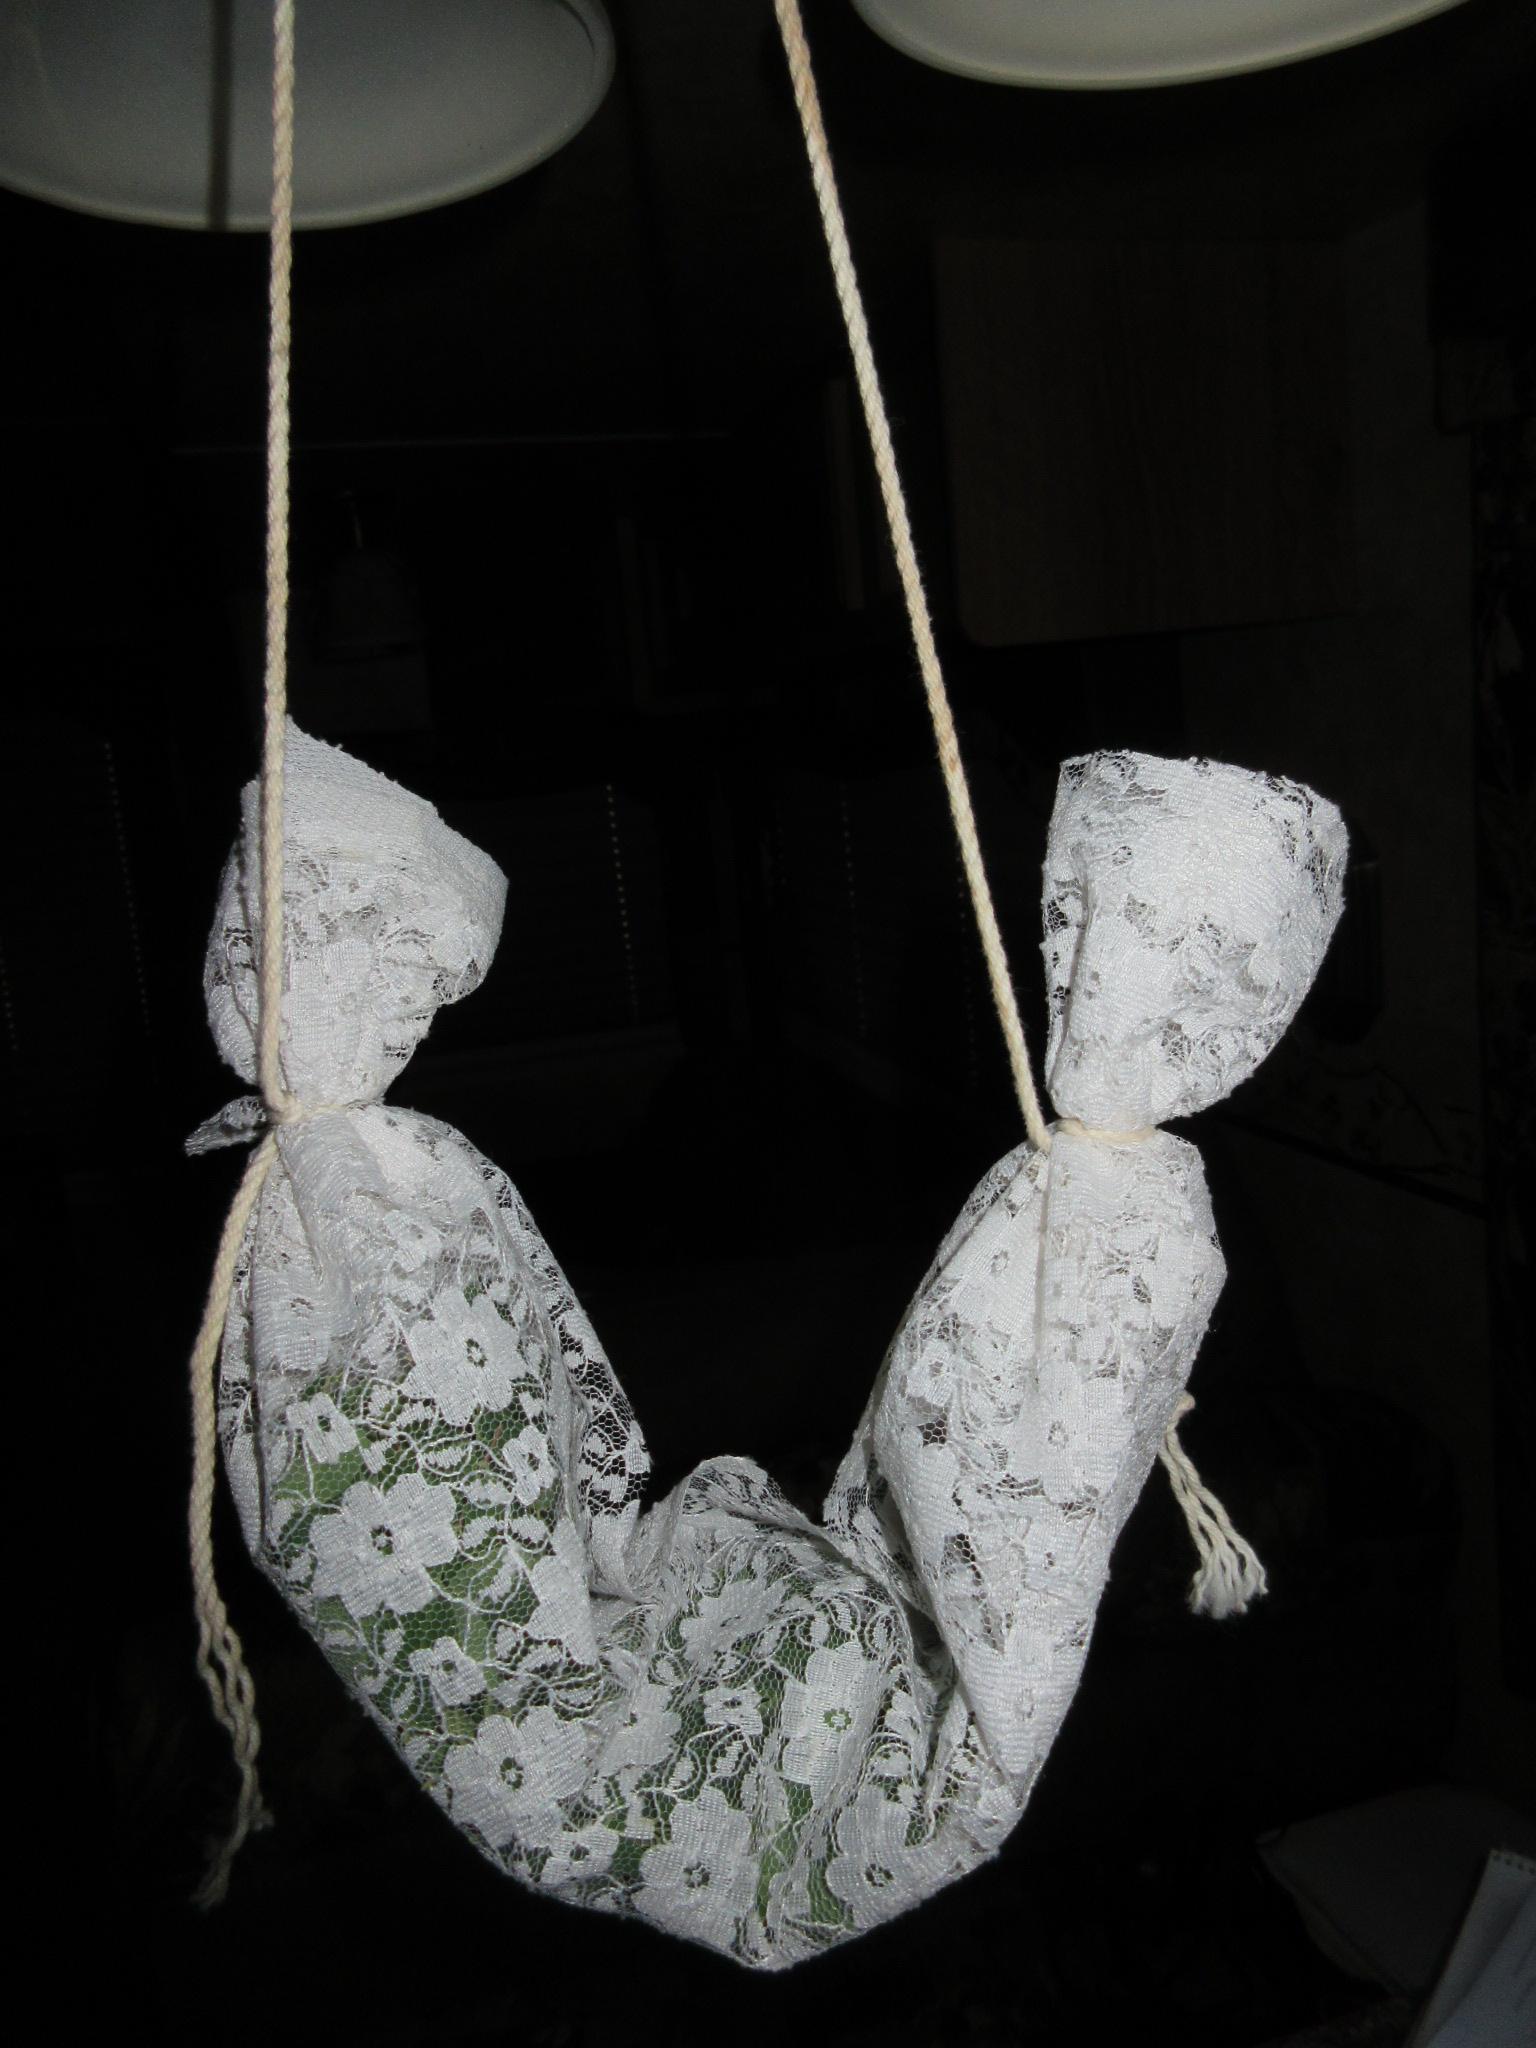 moringa booster bites